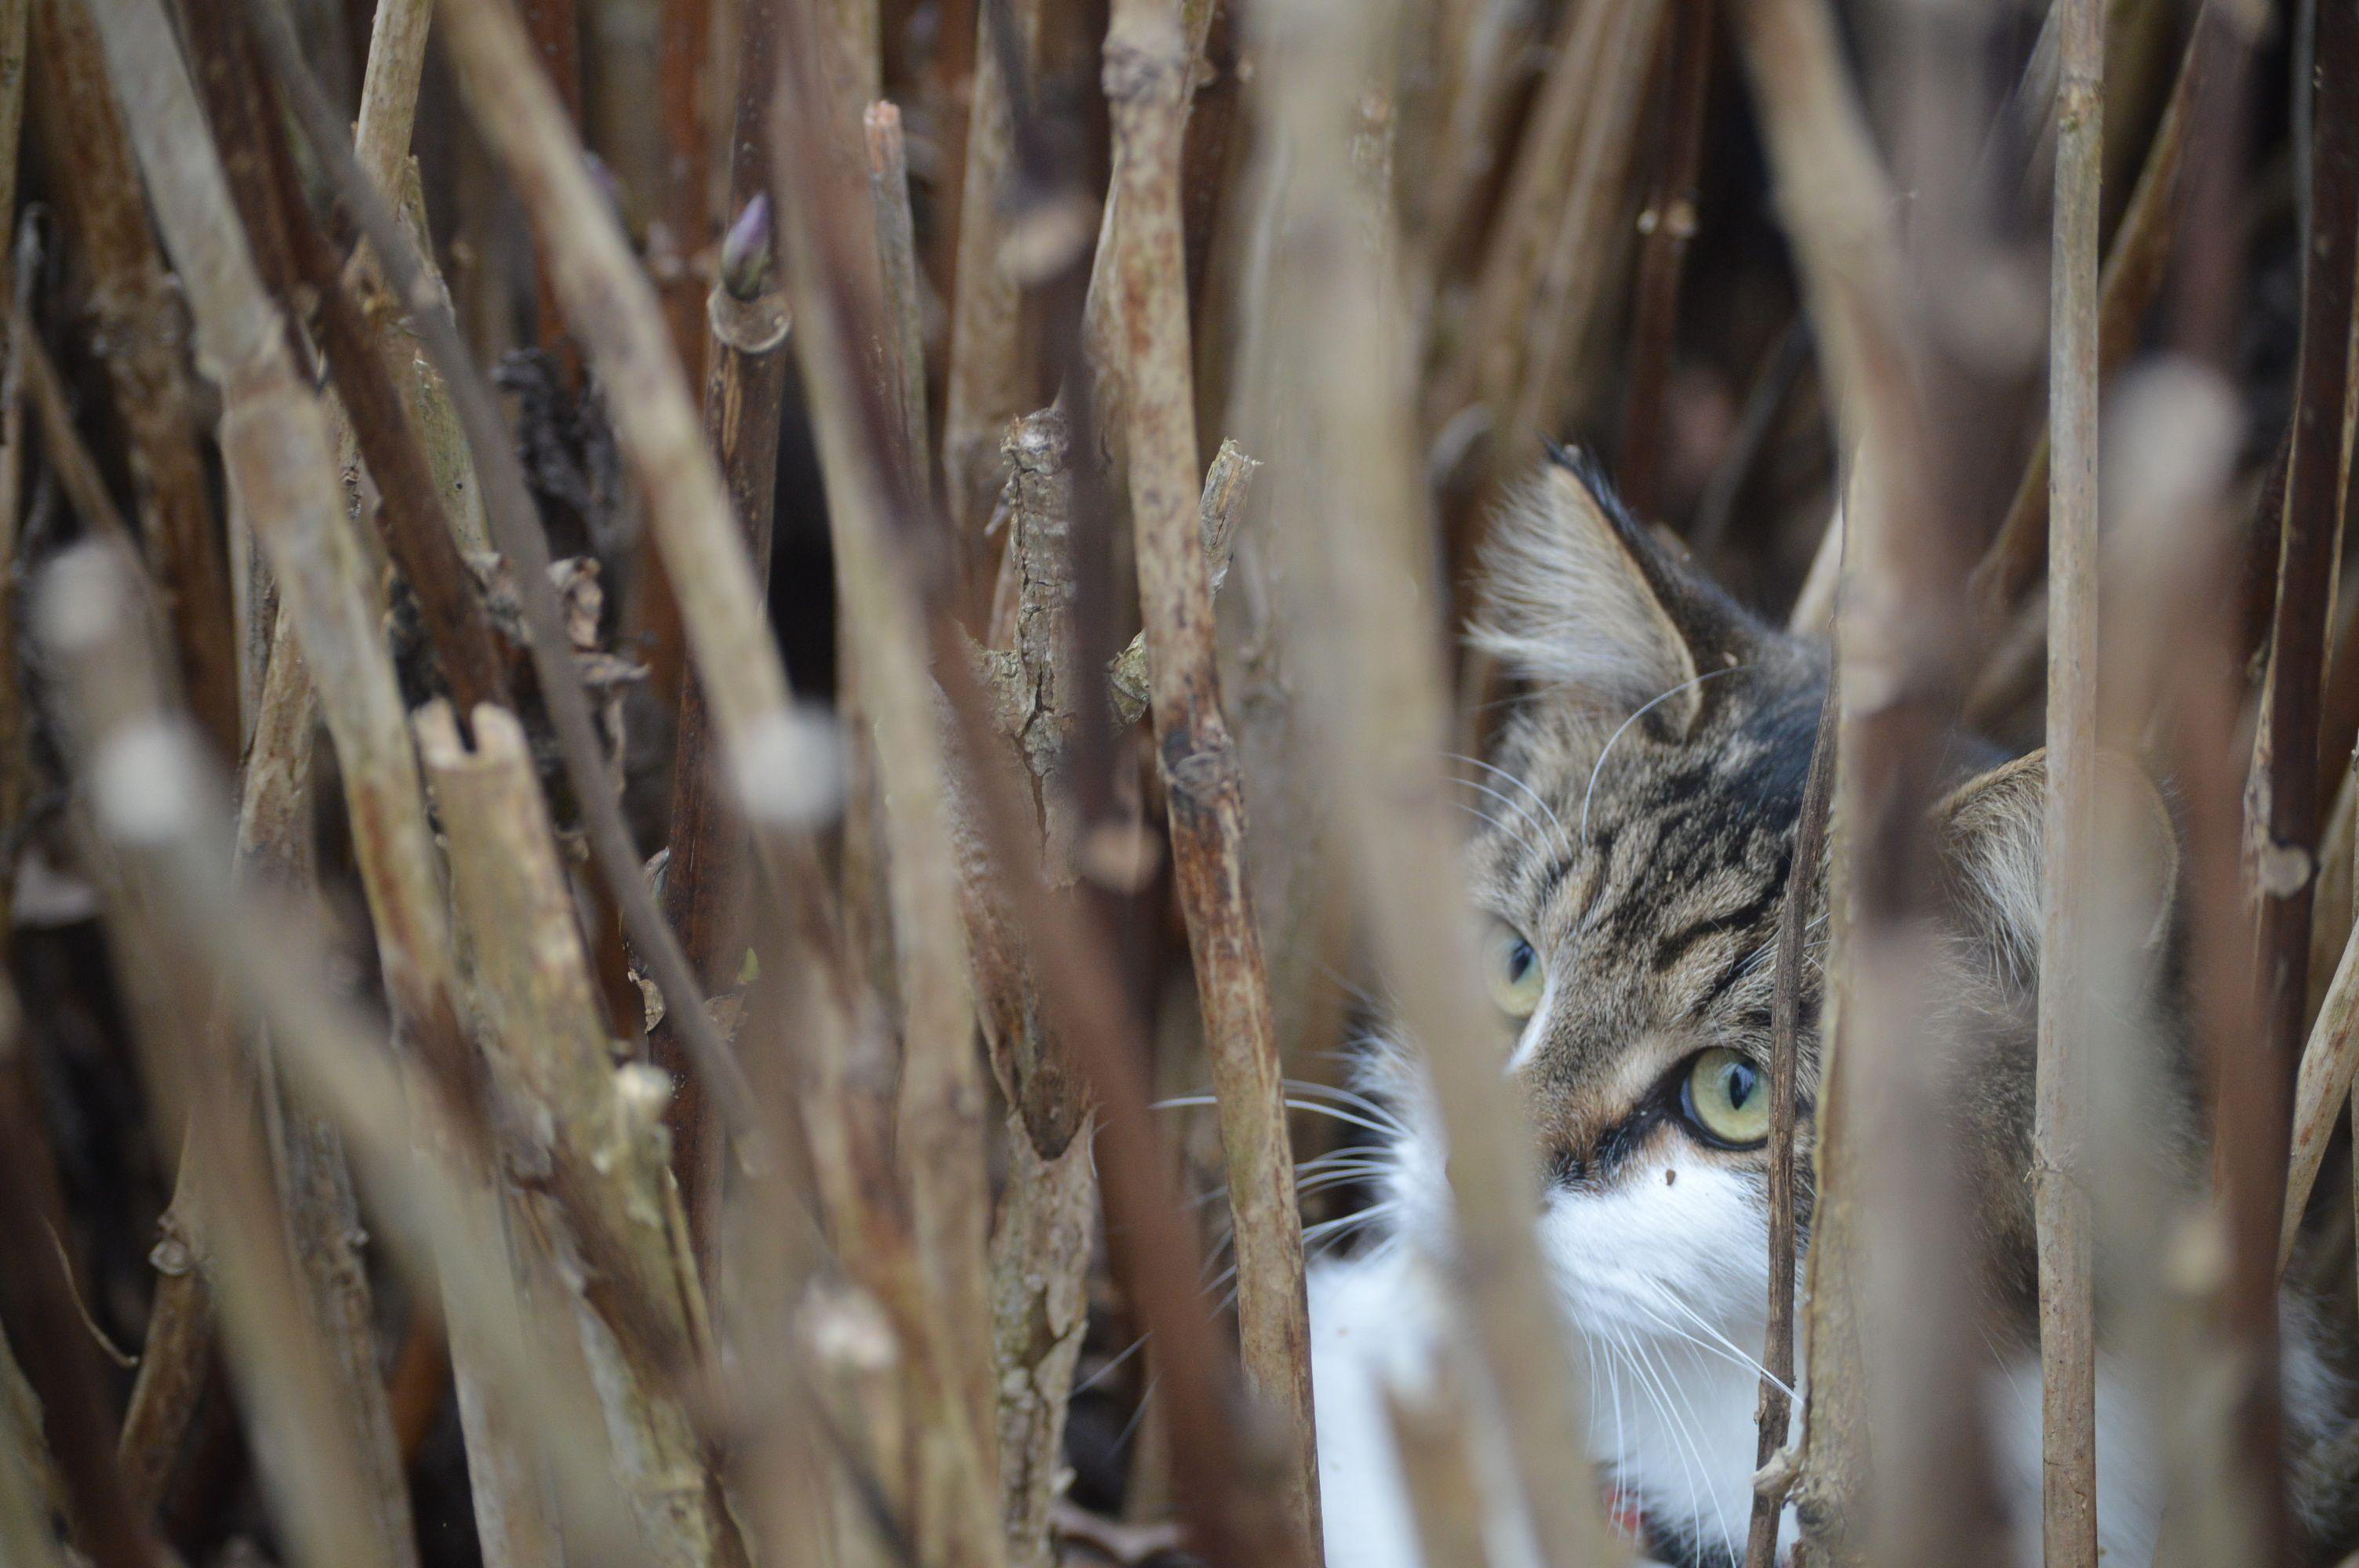 Pin by Jordan ) on catsssss Animals, Cats